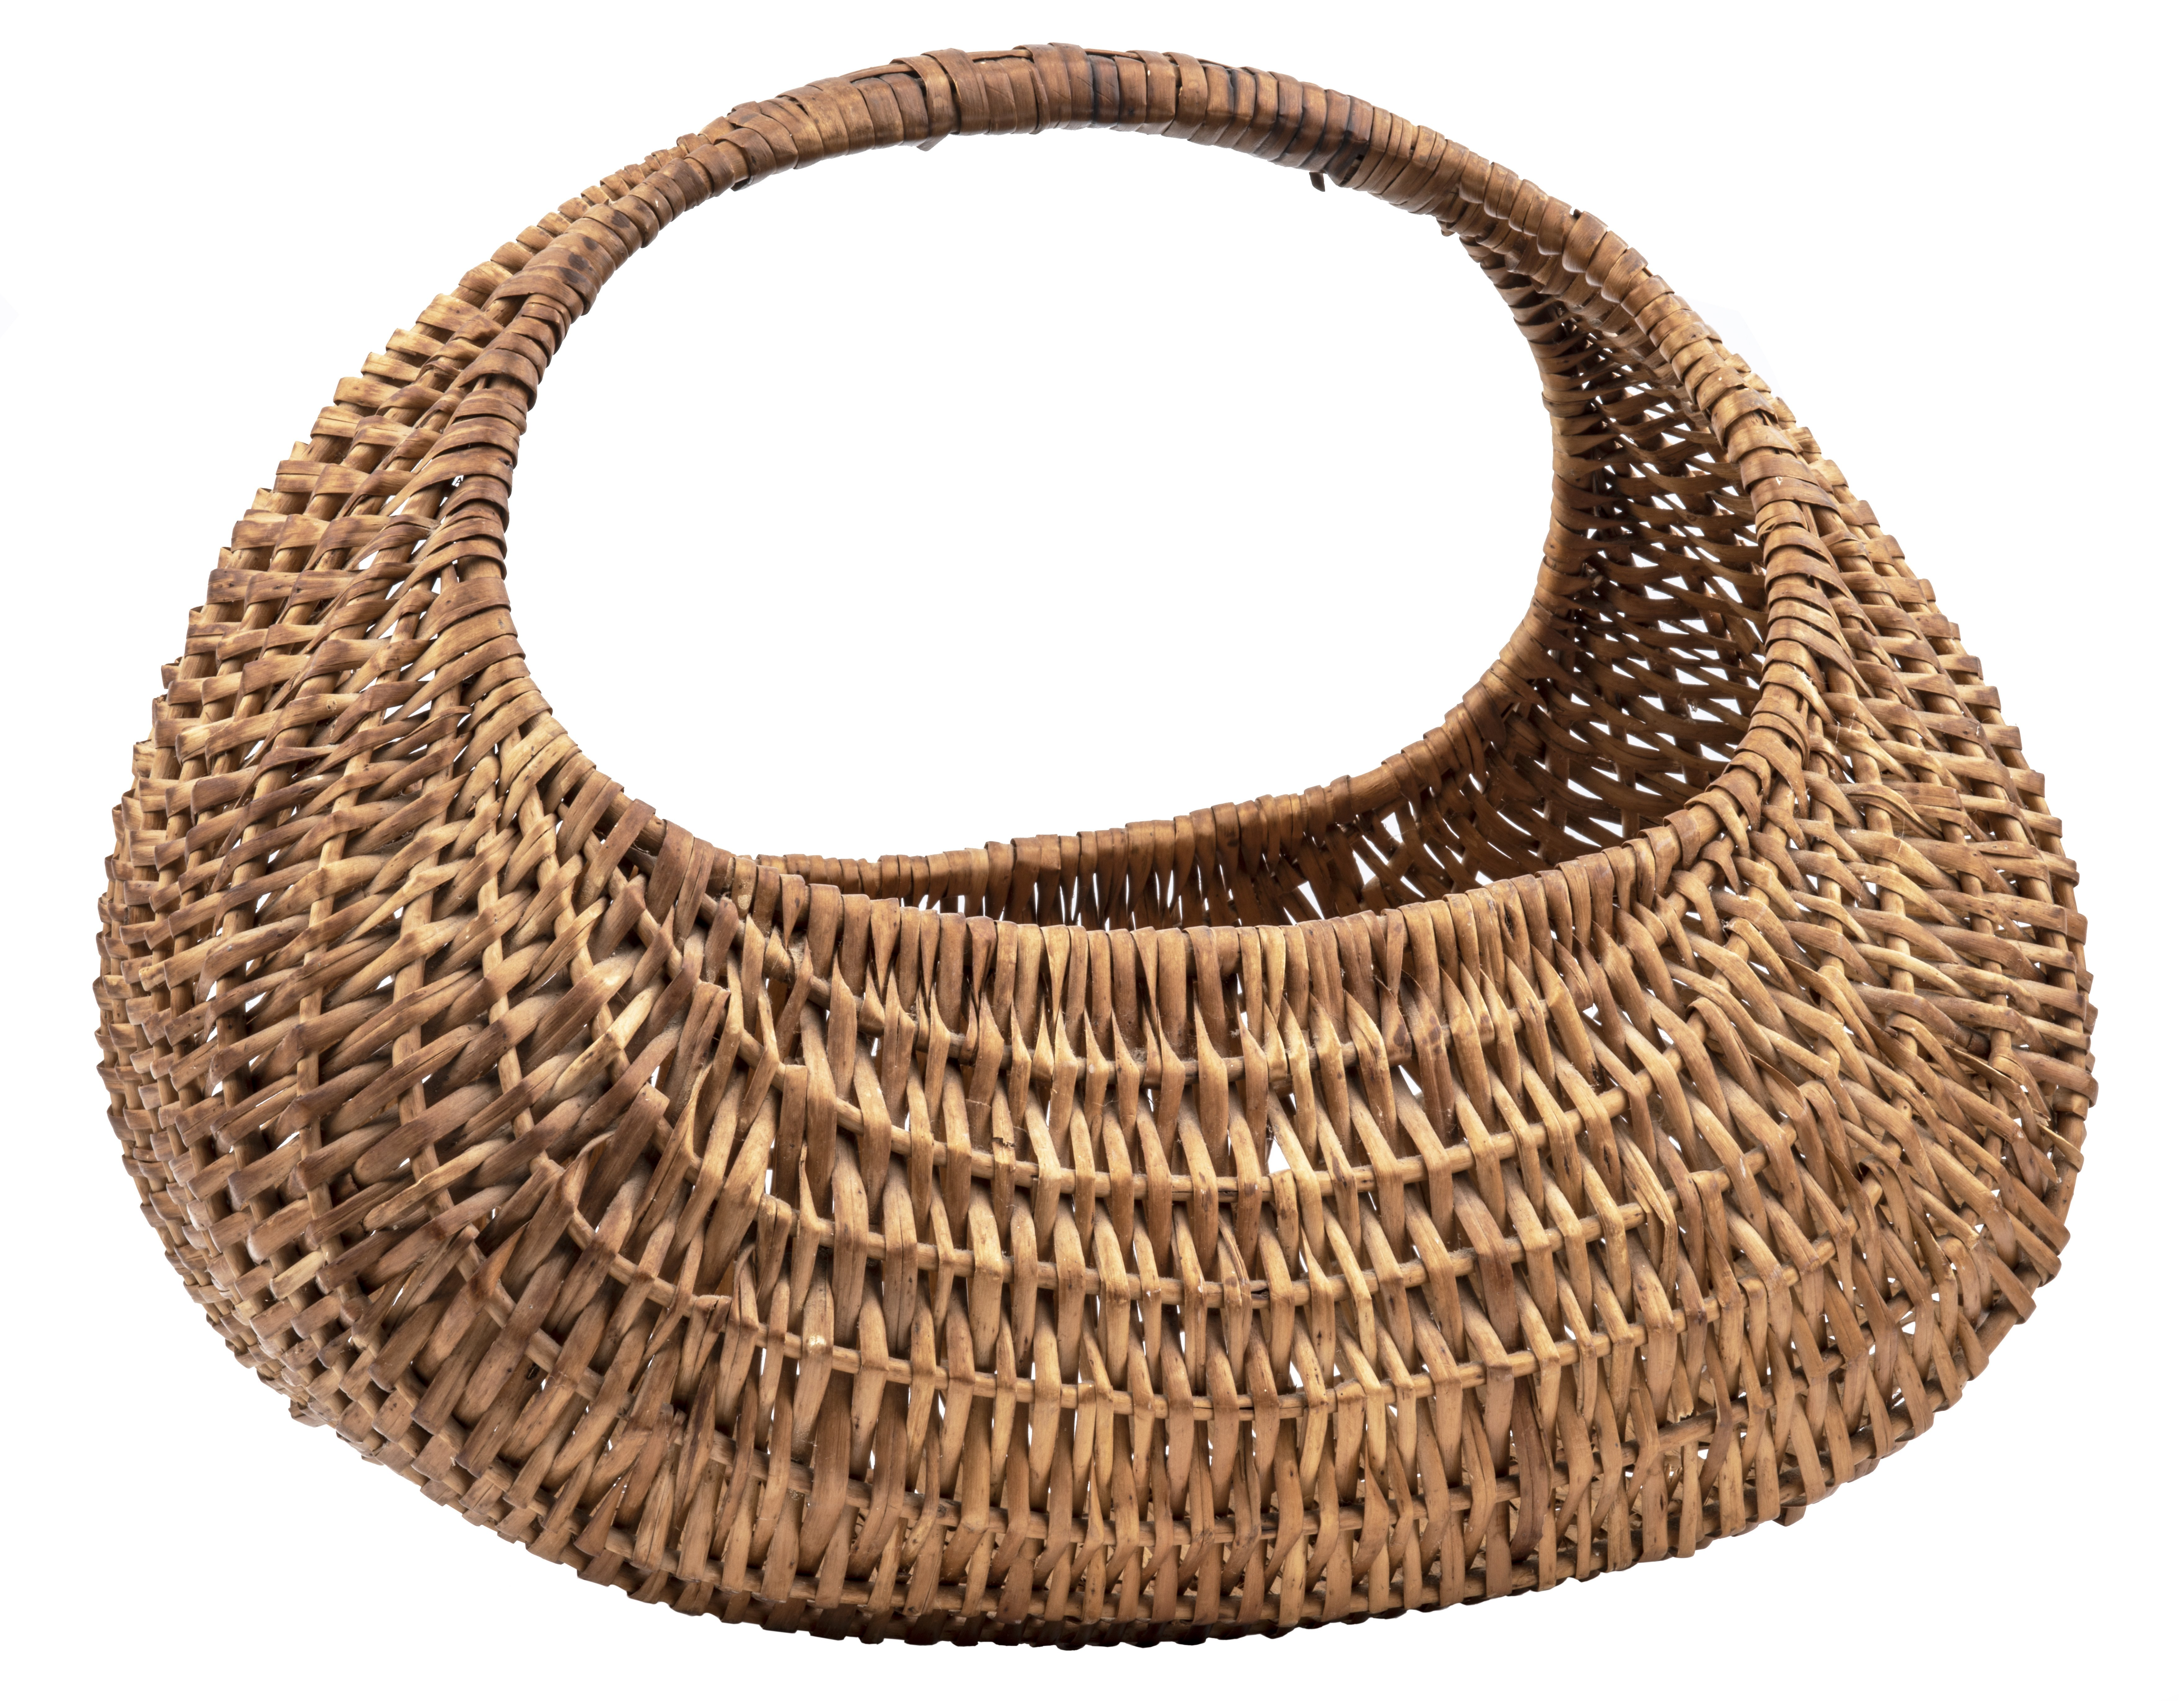 An Antique American Primitive Reed Basket